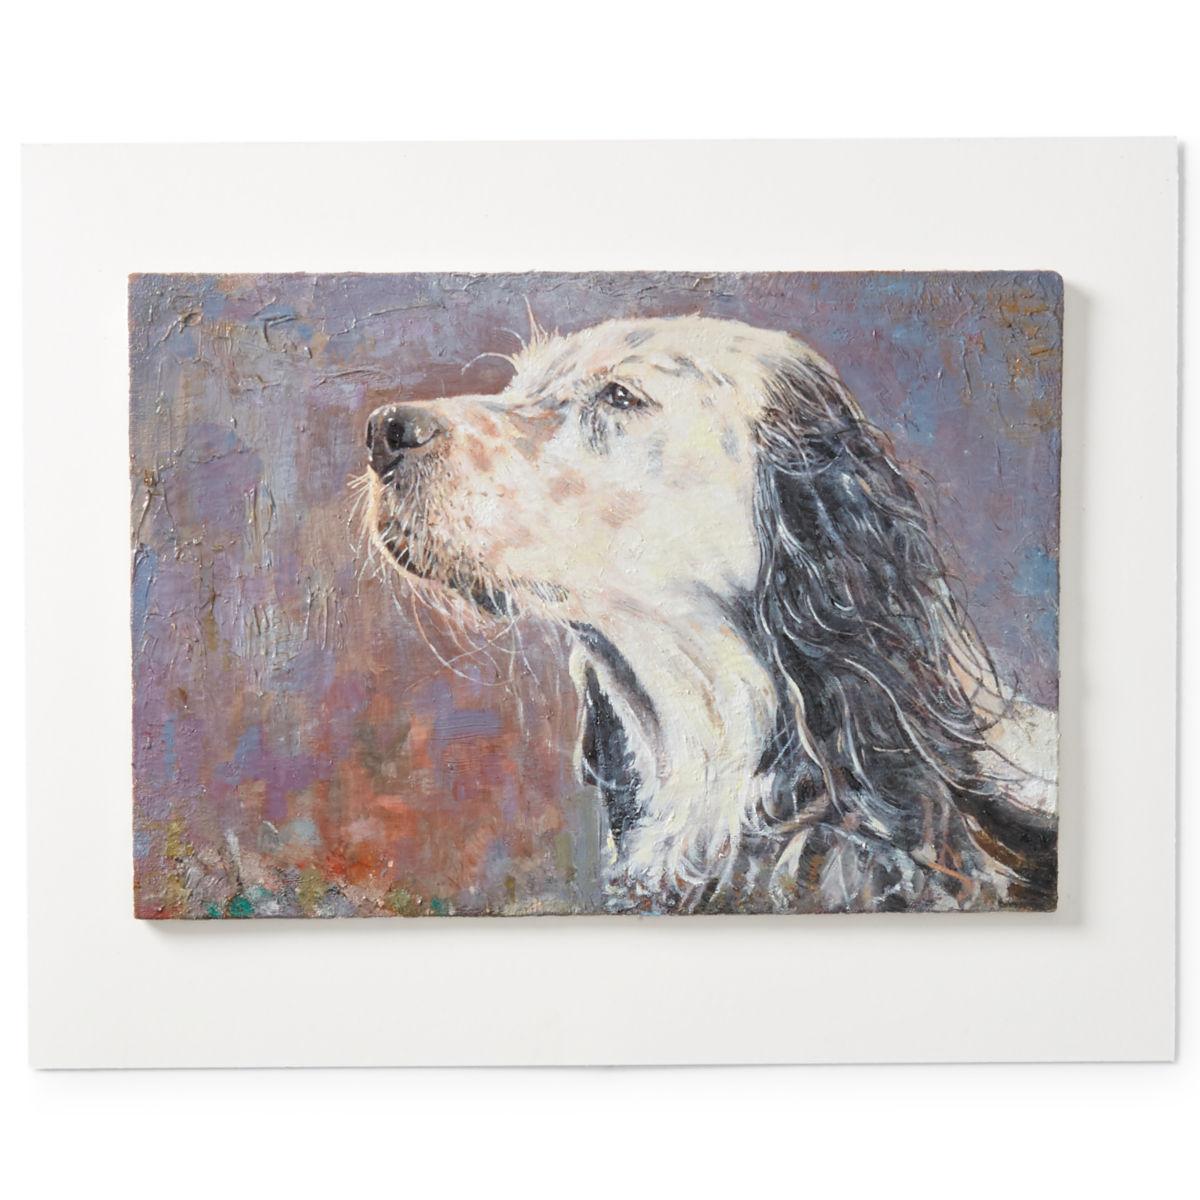 Custom Dog Oil Painting—Not Framed - image number 0